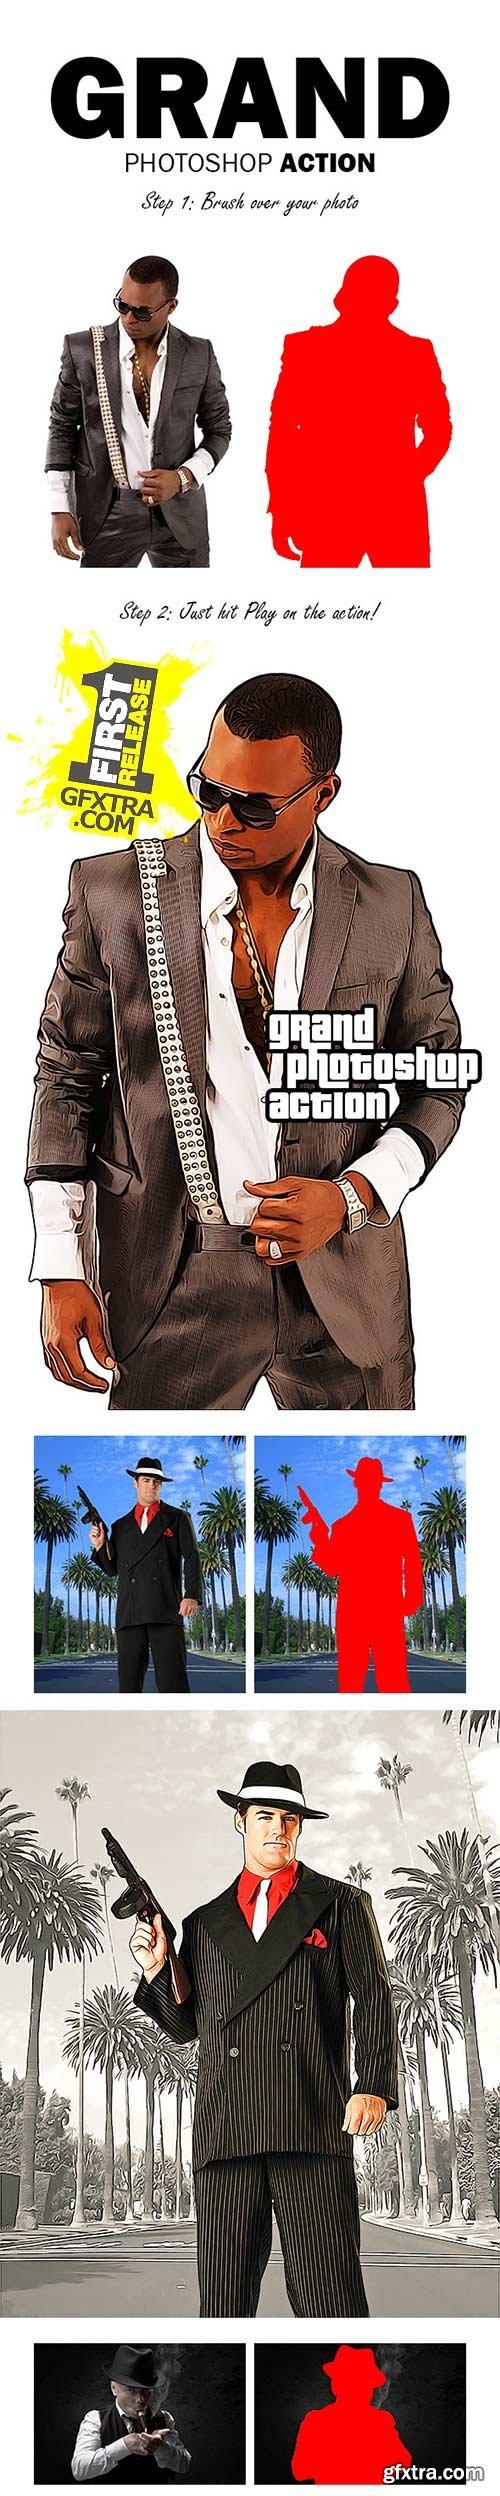 GraphicRiver - Grand Photoshop Action 11341606